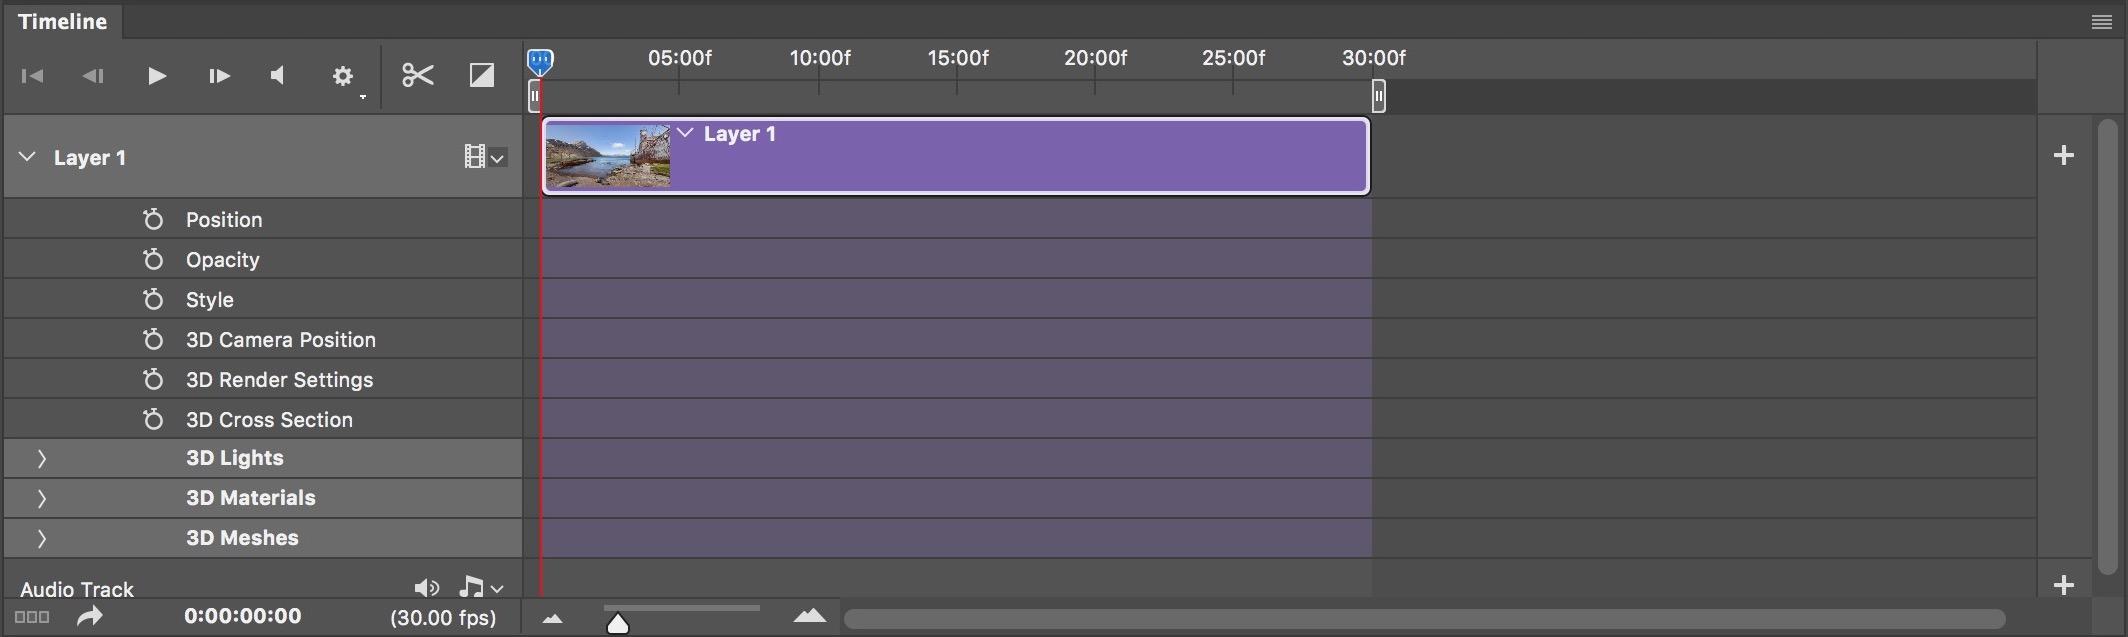 Figure #10 - Layer 1 Timeline Controls